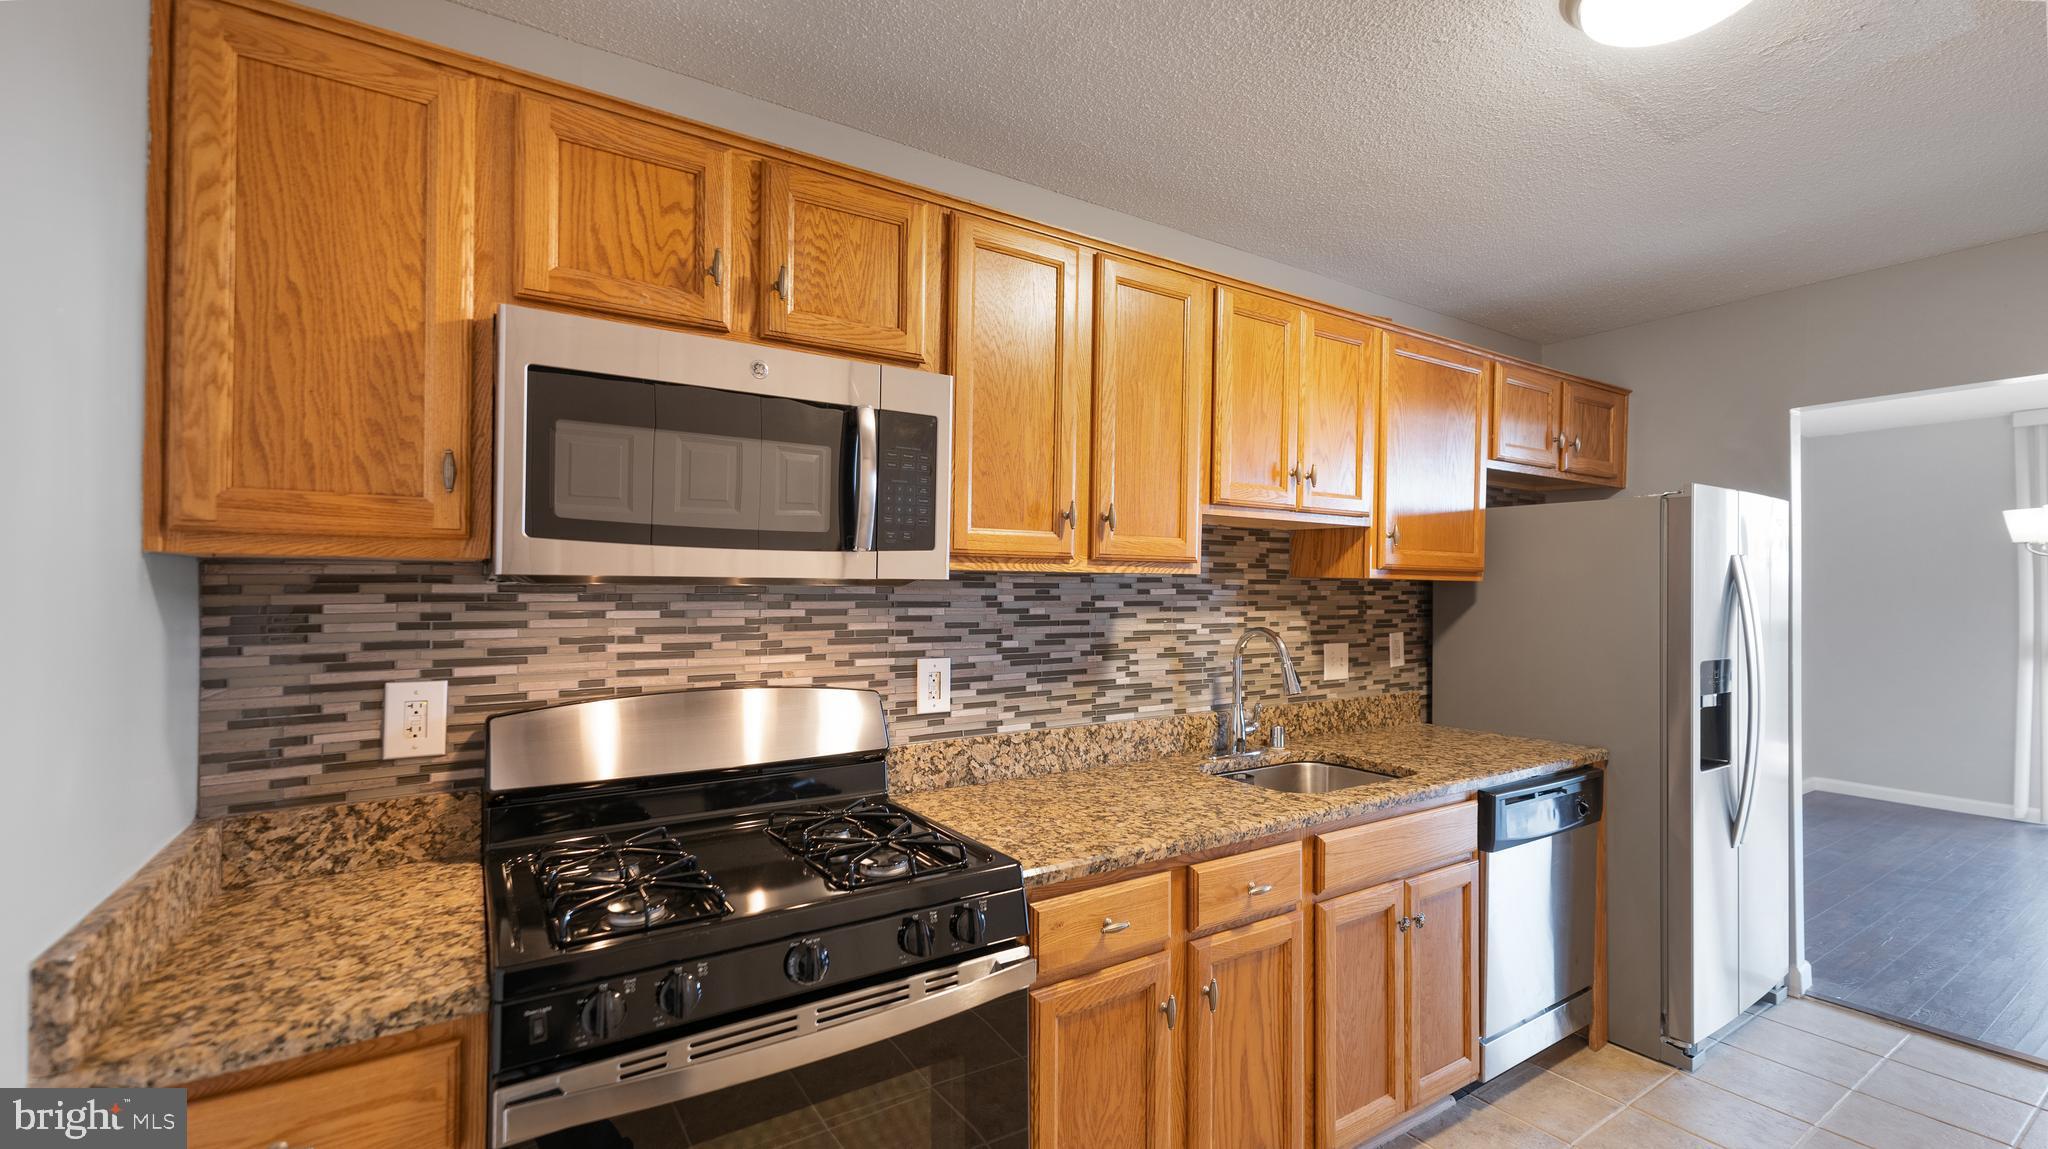 6100 WESTCHESTER PARK DRIVE, College Park, Maryland 20740, 2 Bedrooms Bedrooms, ,2 BathroomsBathrooms,Condominium,For Sale,6100 WESTCHESTER PARK DRIVE,MDPG594556